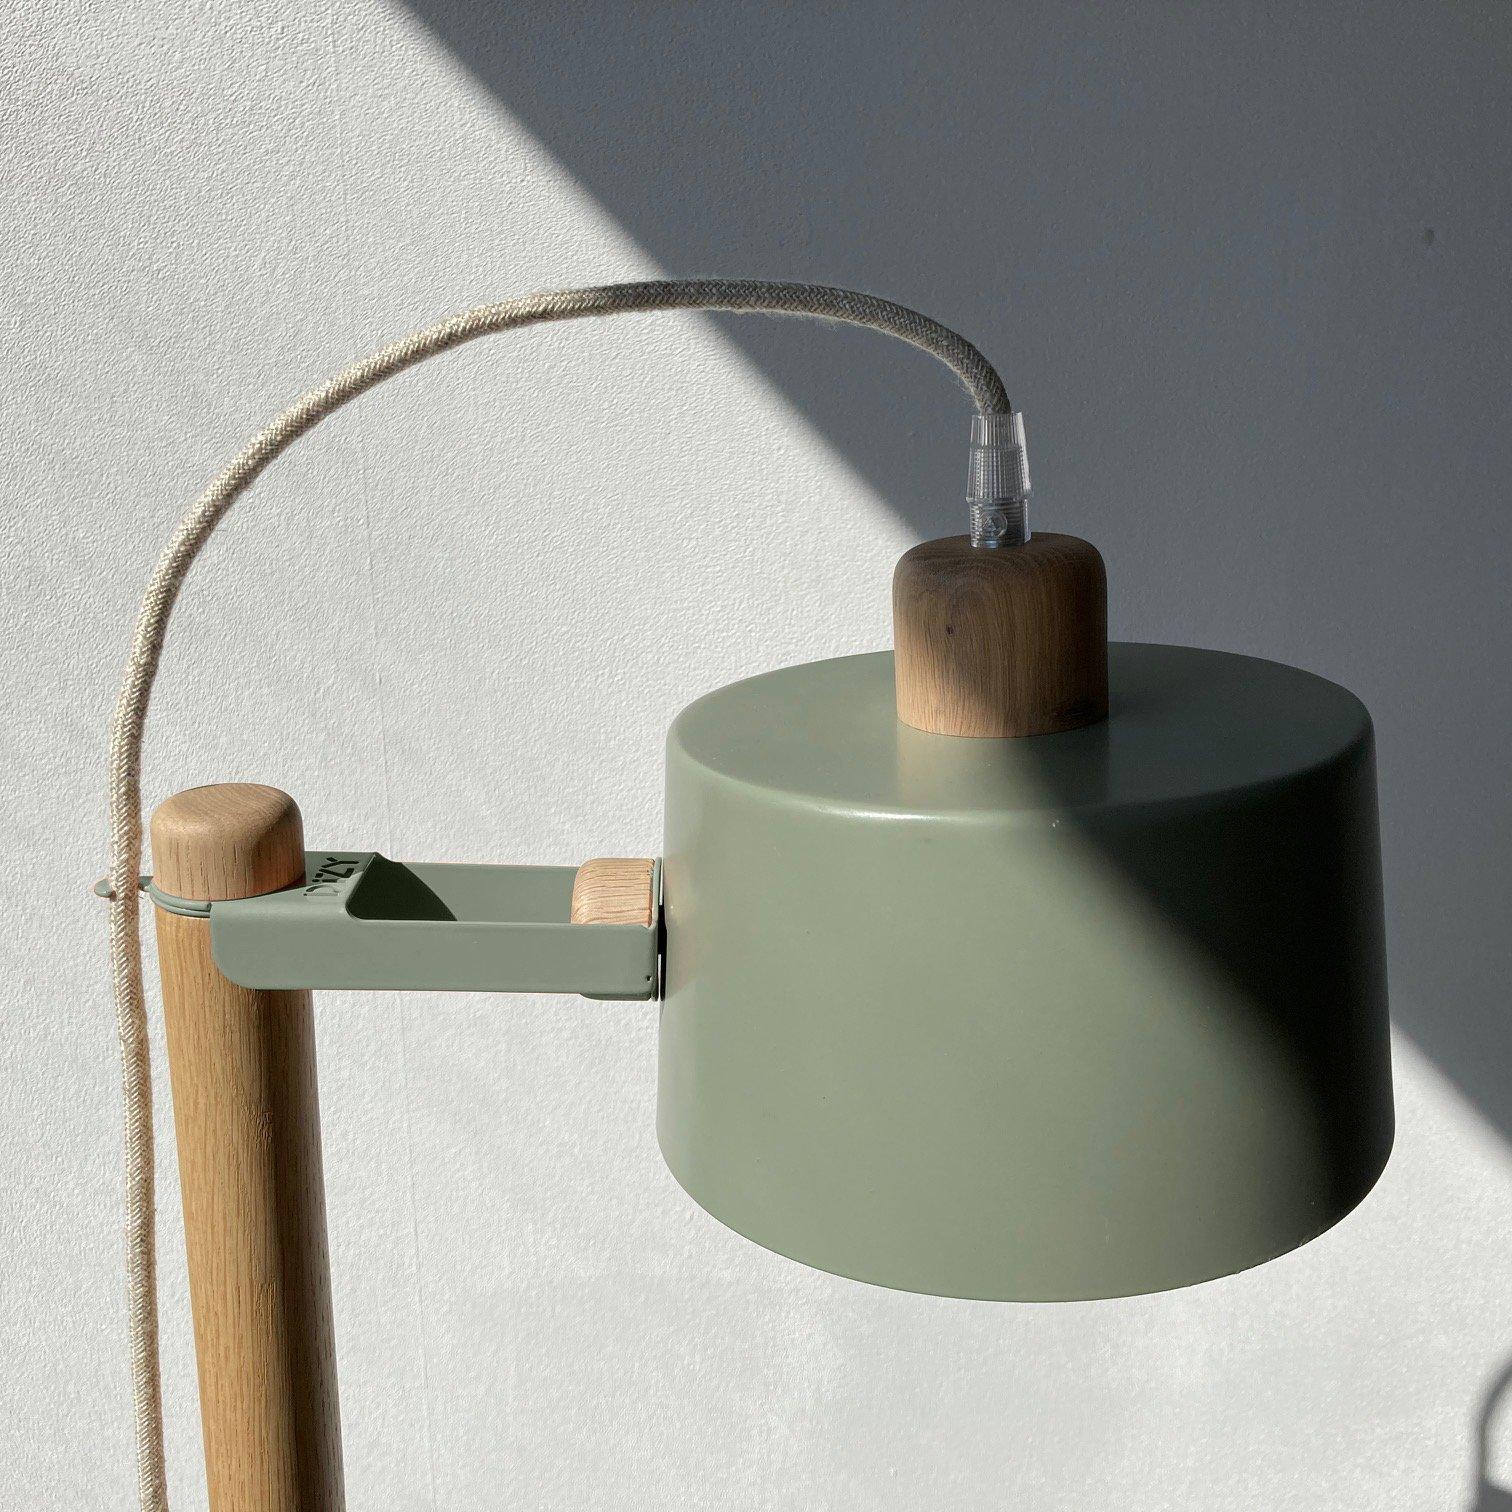 Lampe à poser en chêne et métal vert